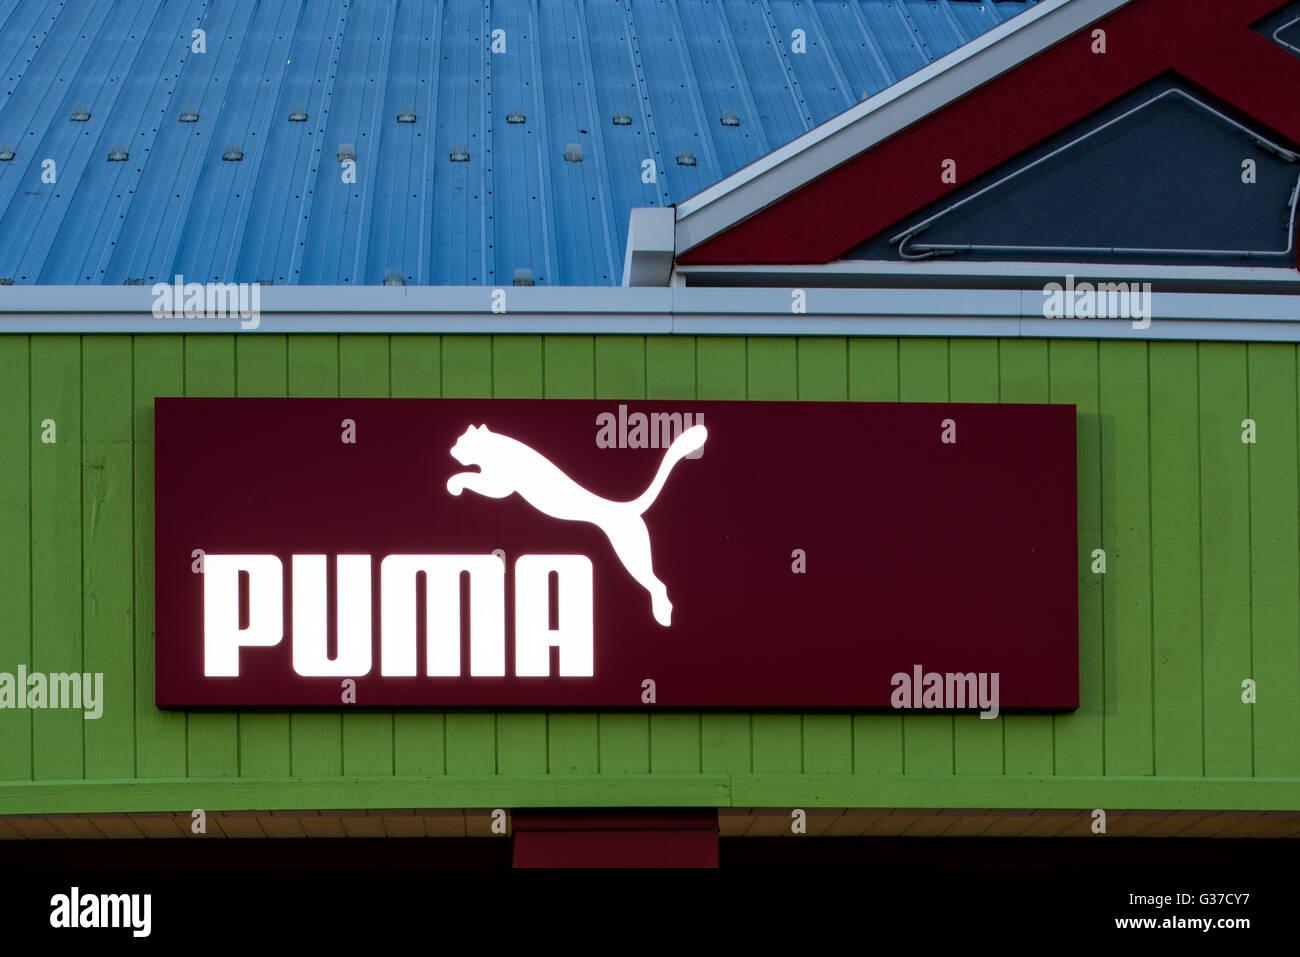 Oshkosh, WI - 5 June 2016: Puma store sign illuminated at night - Stock Image